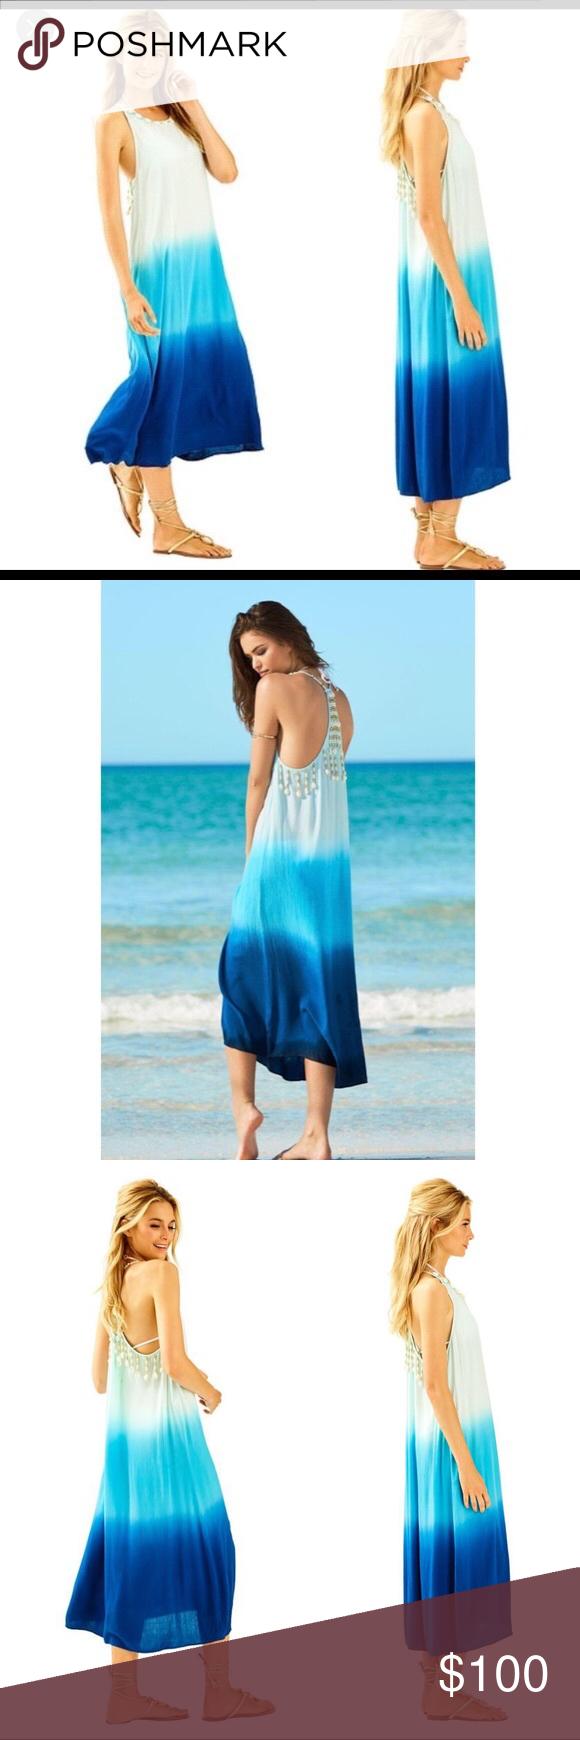 36816edfab Ombré Kenli Midi Coverup Bundles available! (J) Lilly Pulitzer Dresses